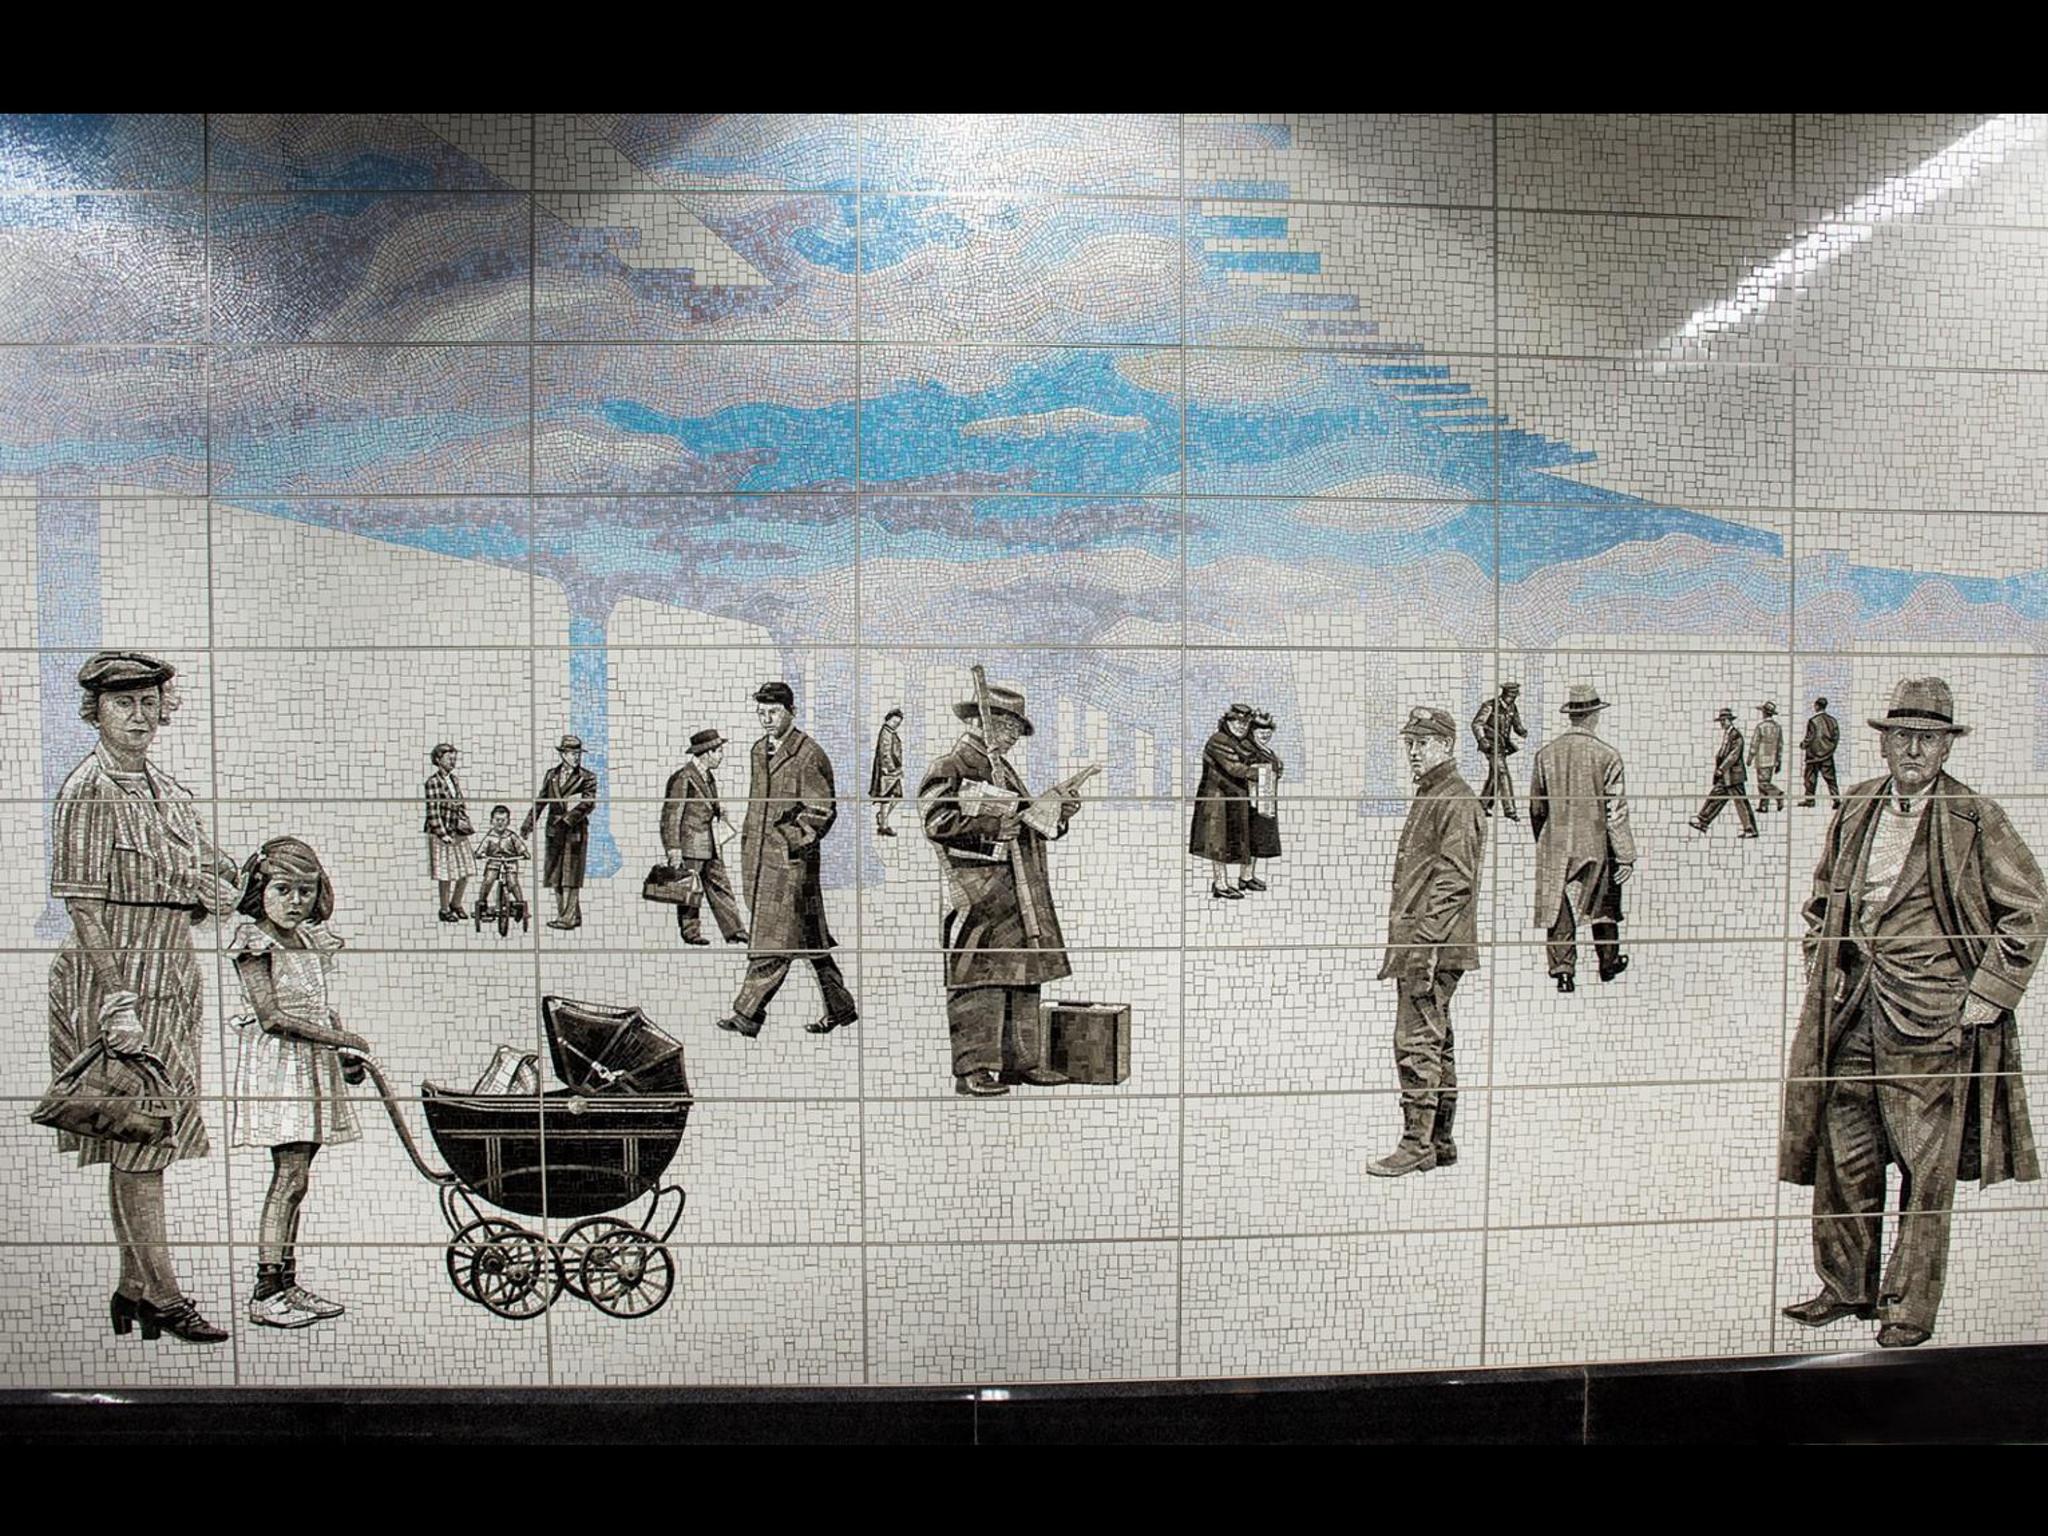 Shin's art installation on Second Avenue x 63rd Street station